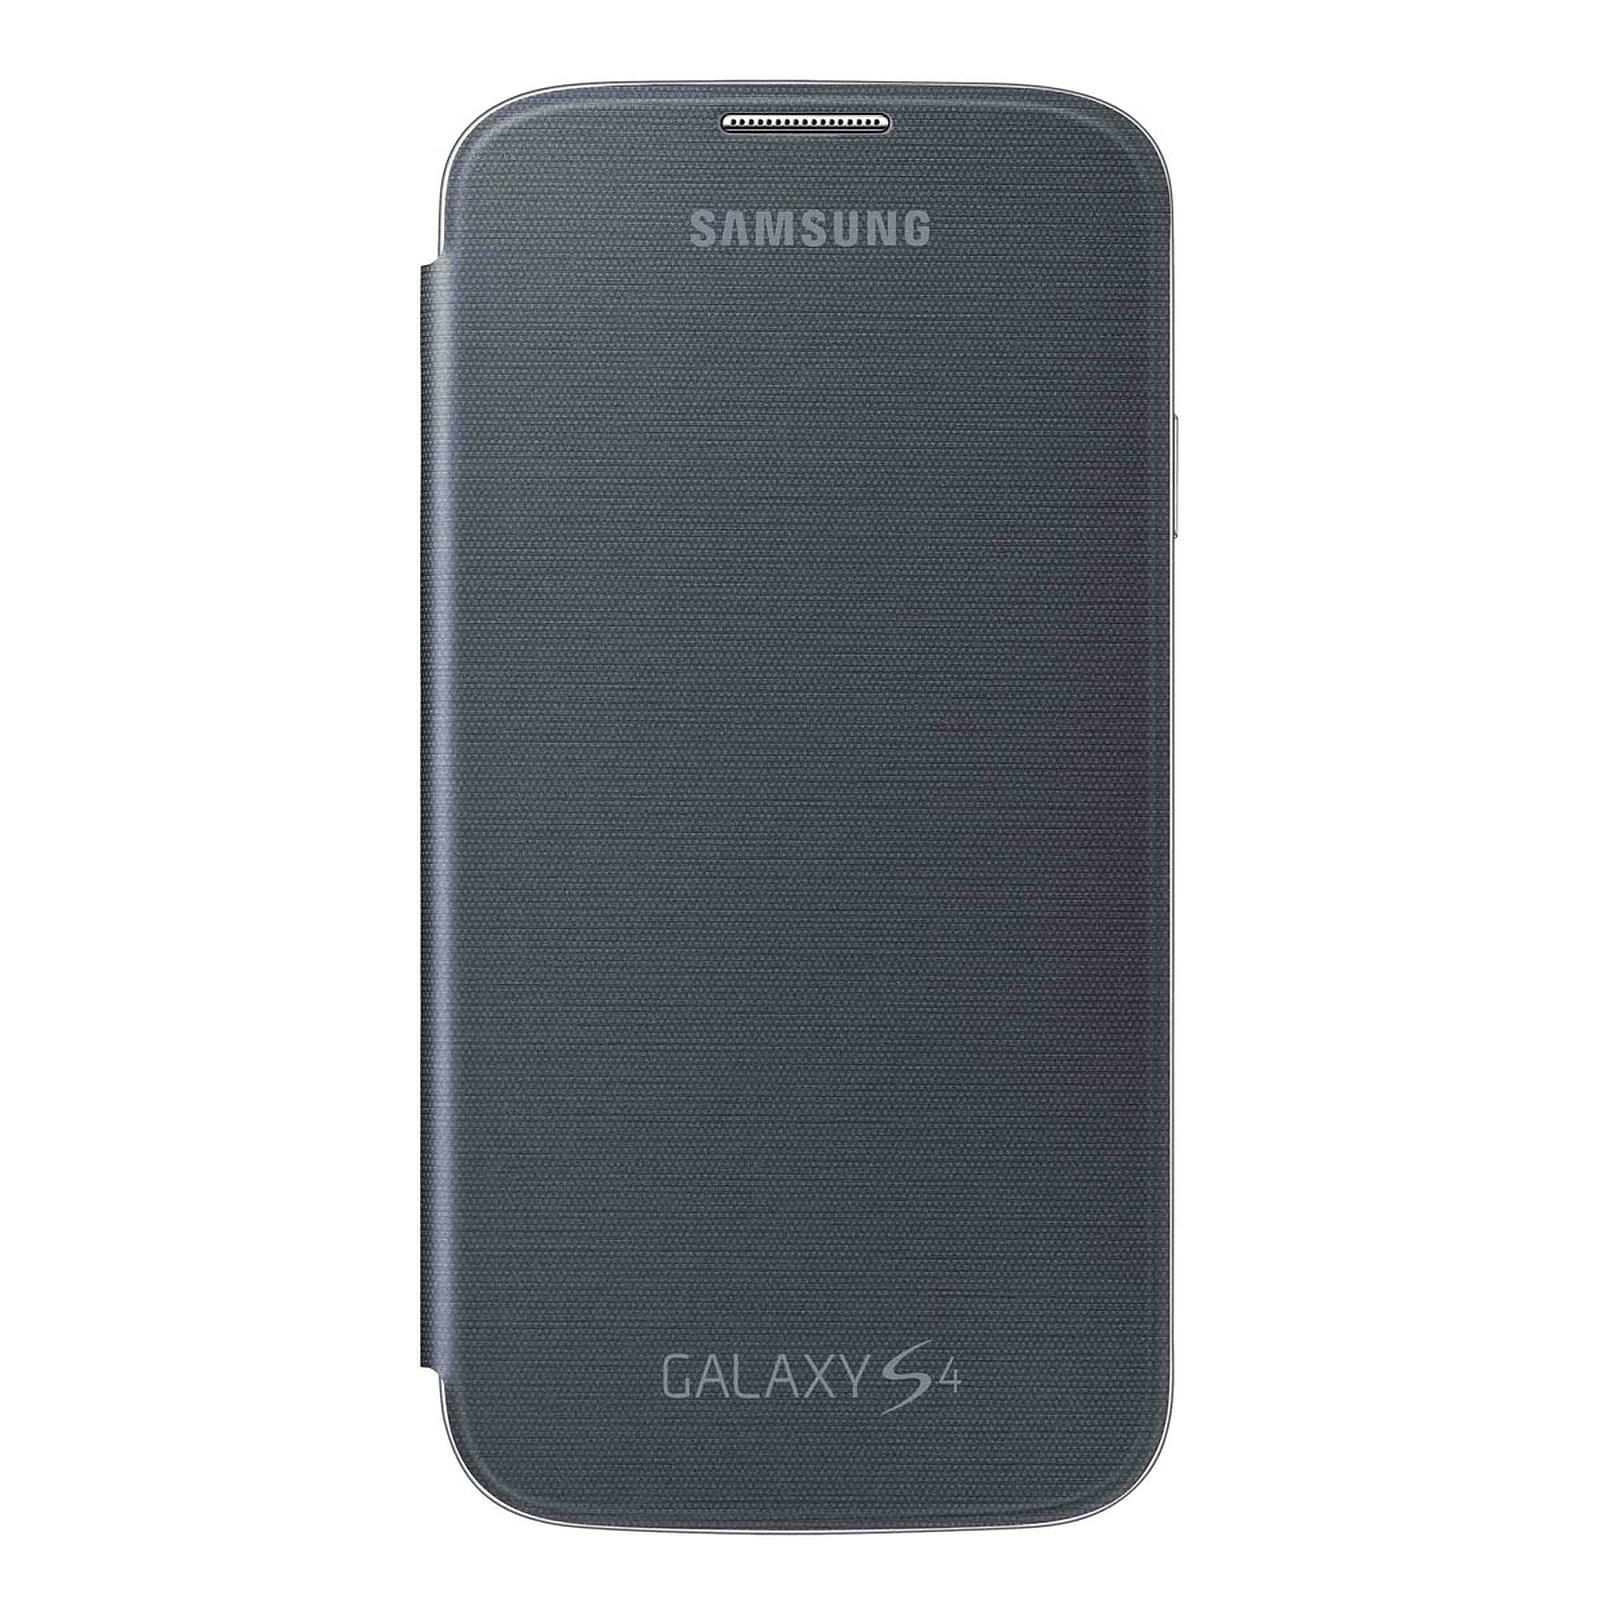 Samsung EF-FI950N - Etui Flip Cover Noir pour Galaxy S4